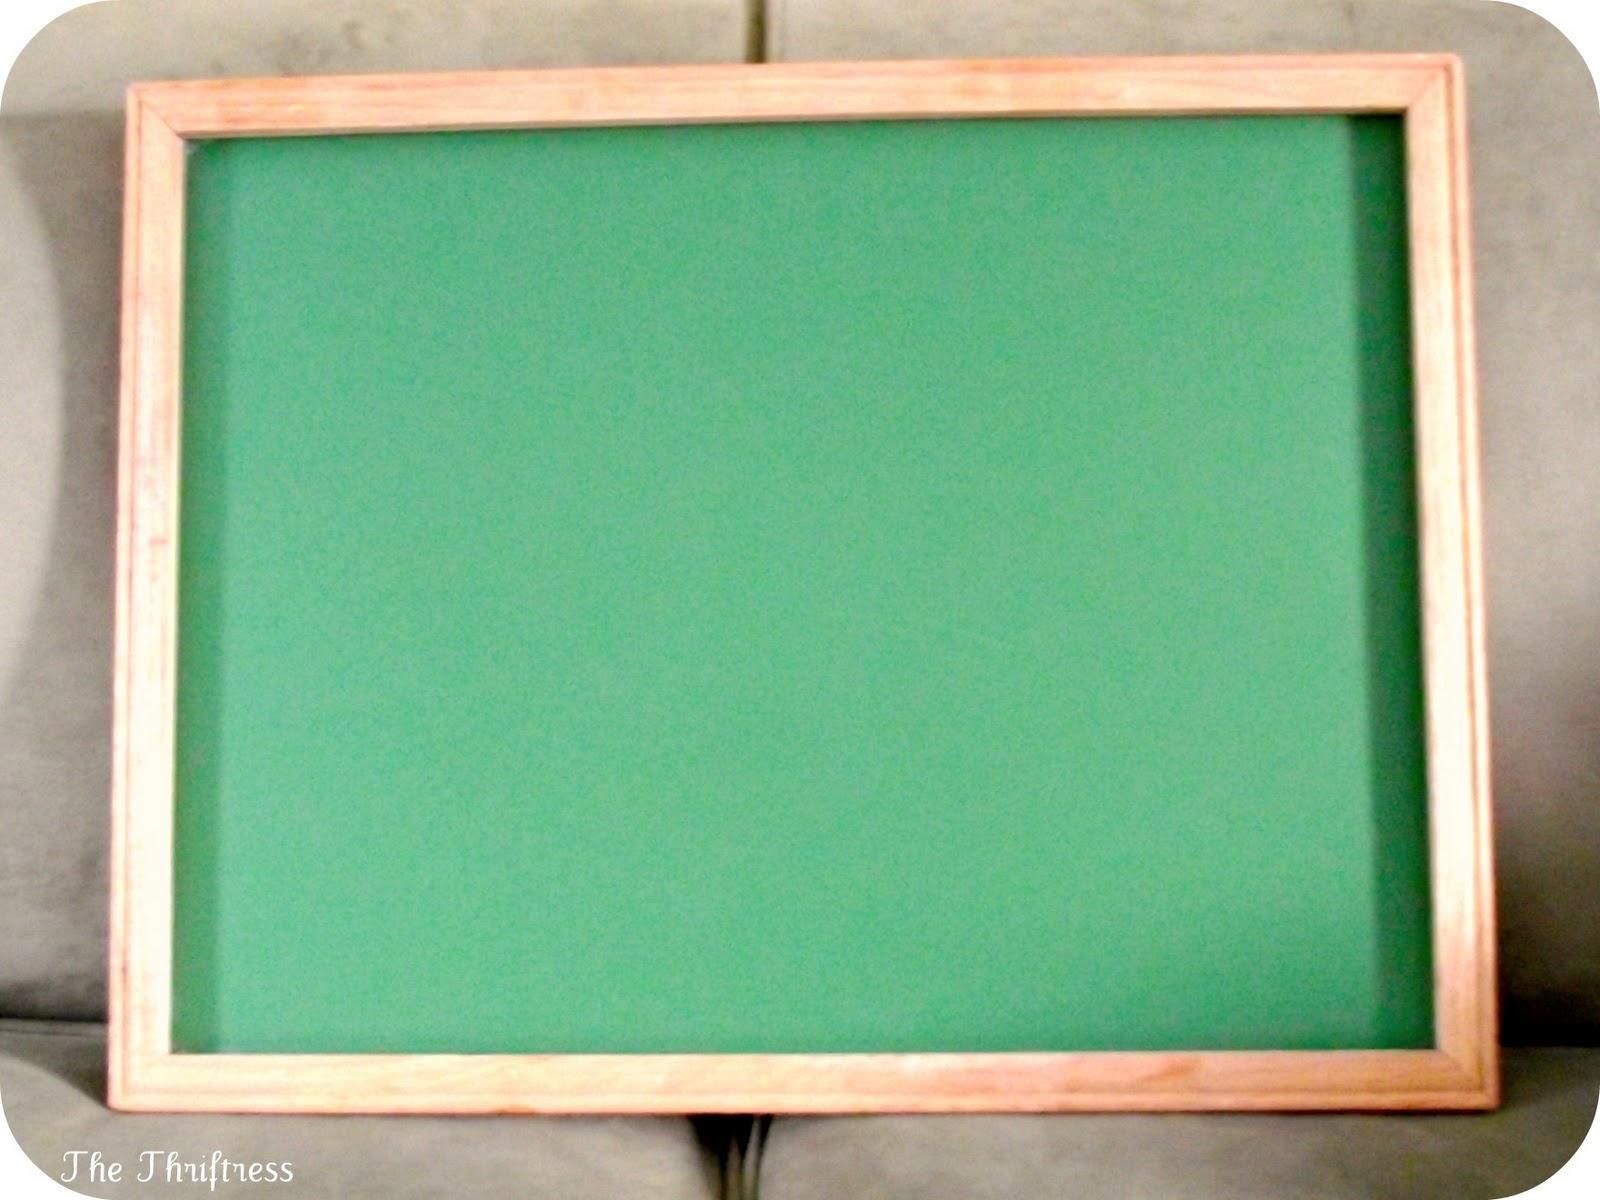 1600x1200 Clipart Chalkboard